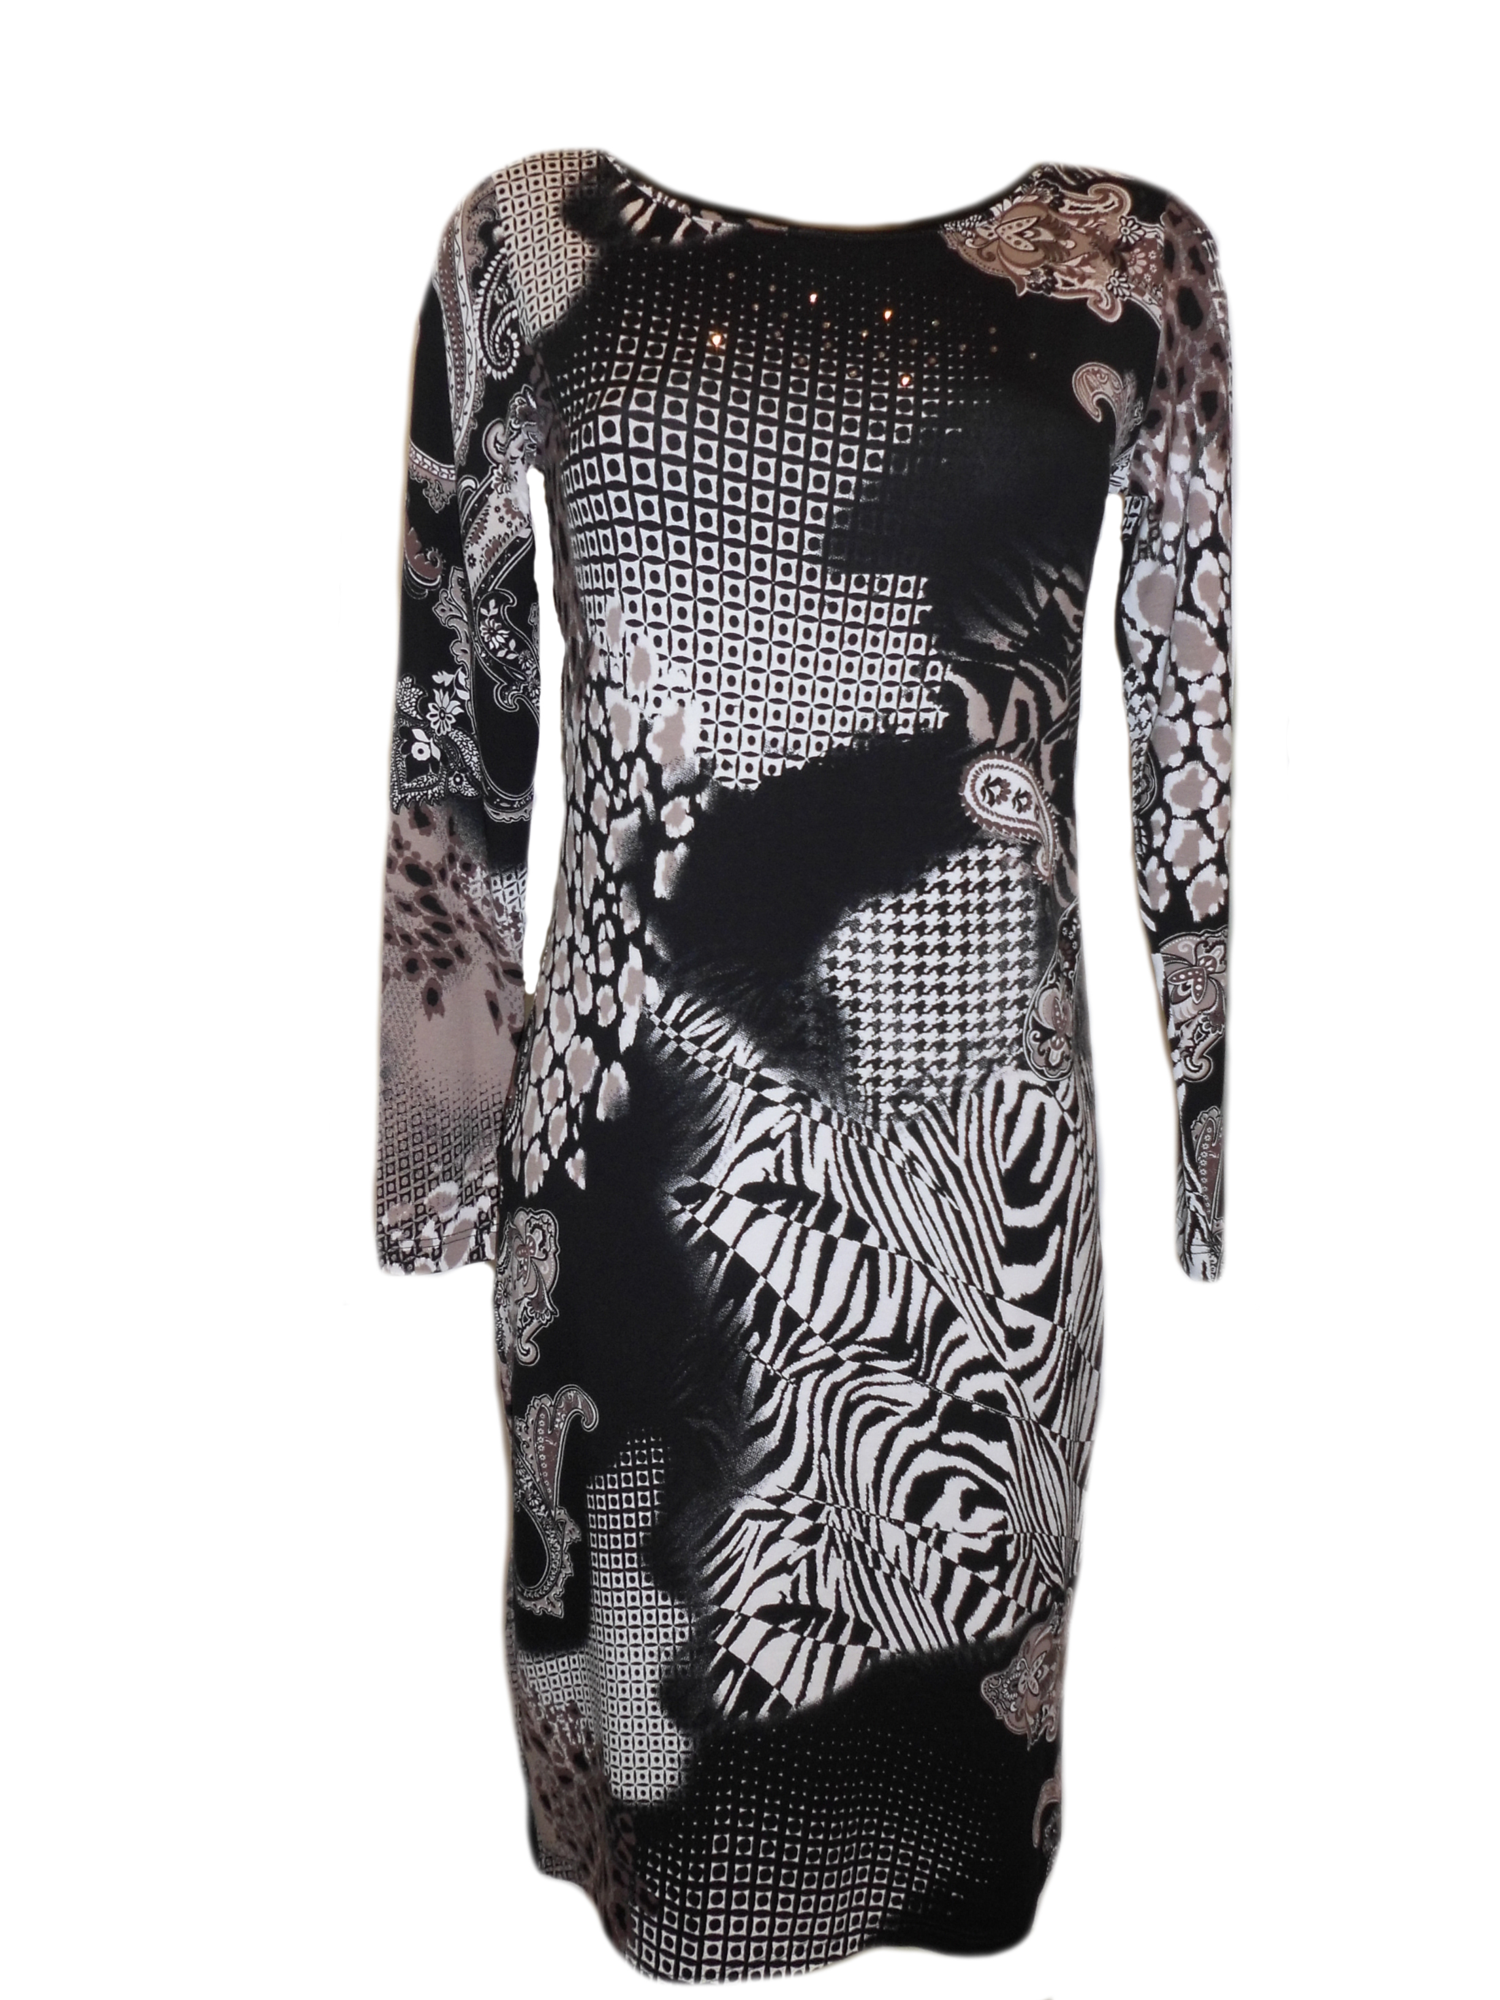 Šaty Marle Vypan DR SW - Favab Barva: černo-hnědá, Velikost: M